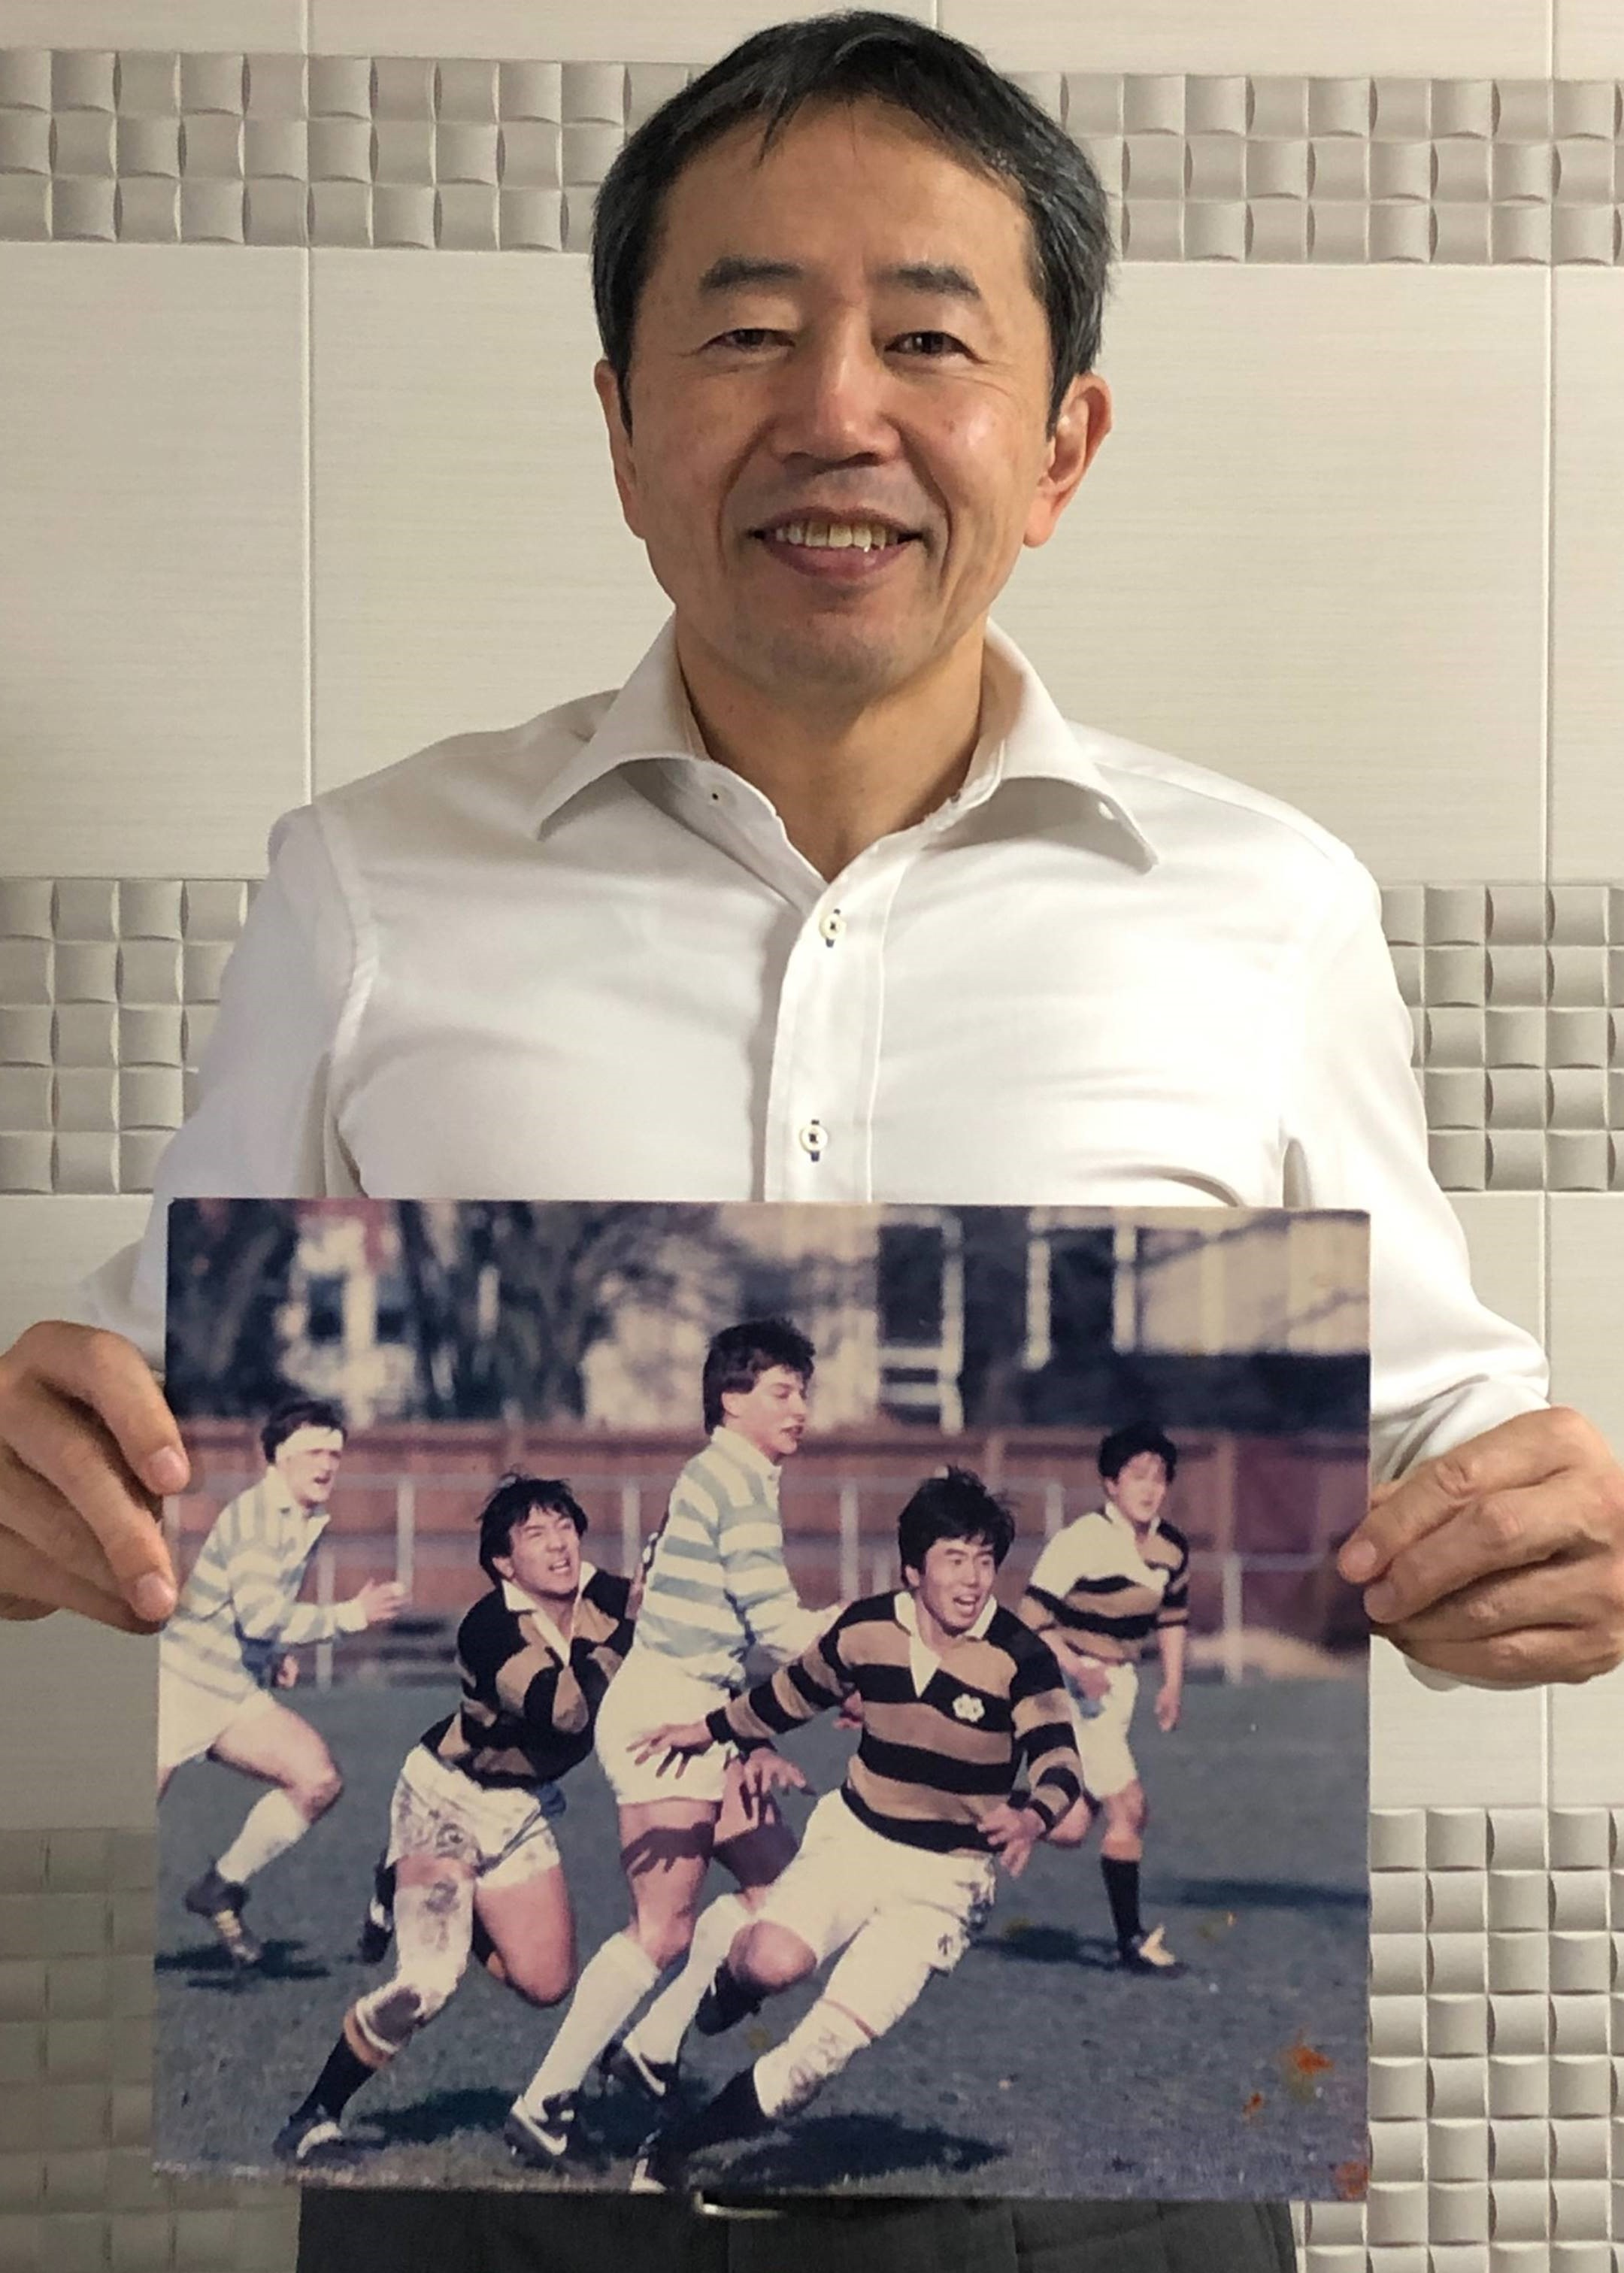 【公式】実使用「慶応ラグビー歴戦の記念品」 松永 敏宏